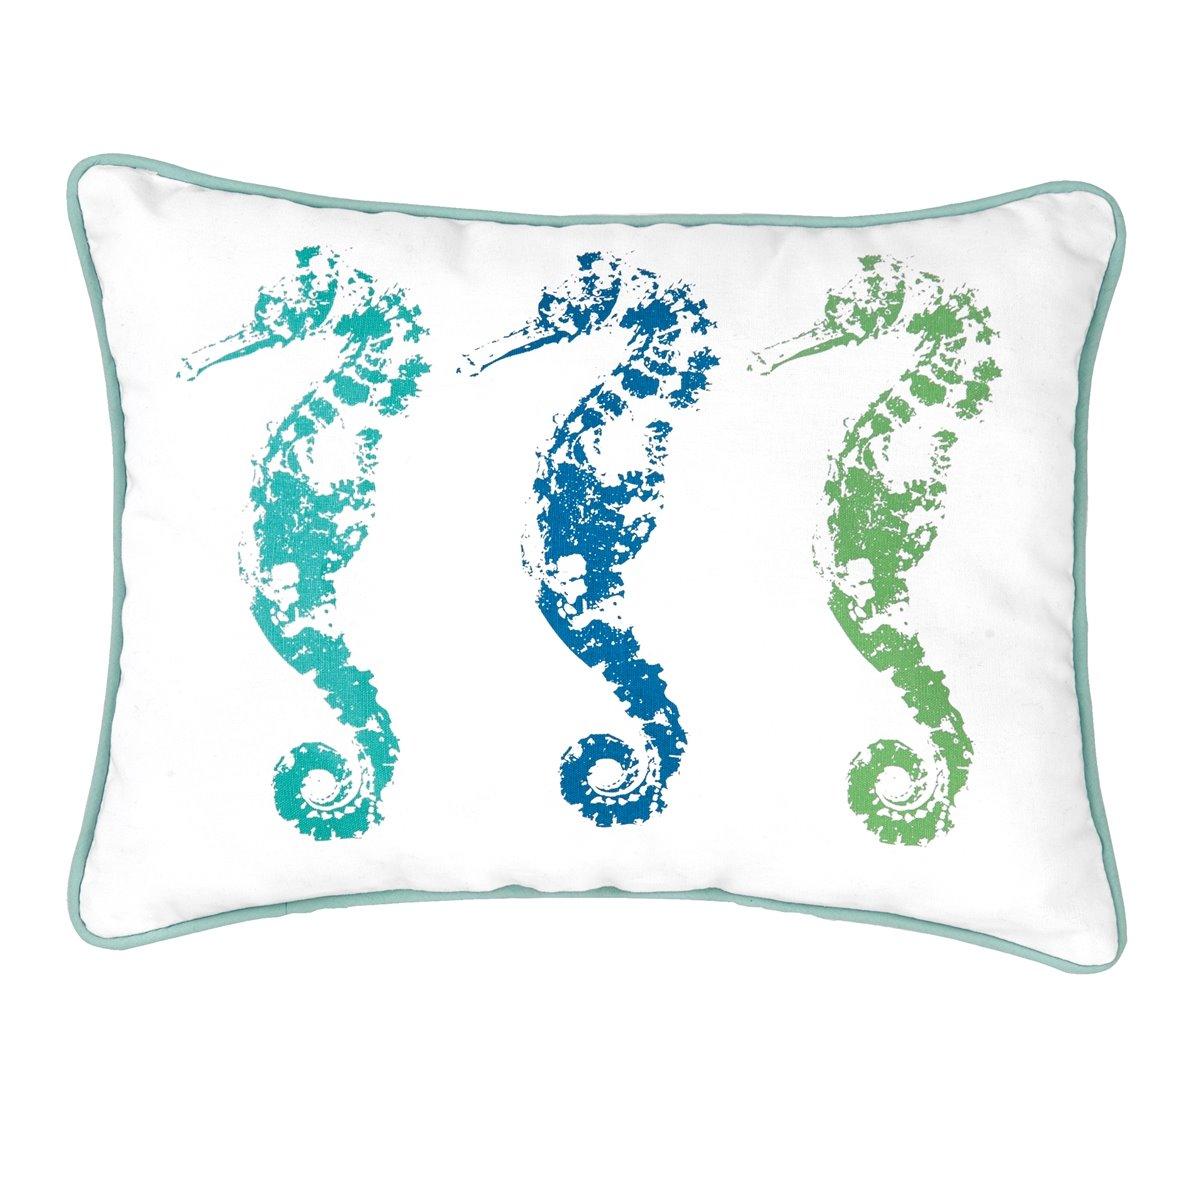 3 Seahorses Pillow